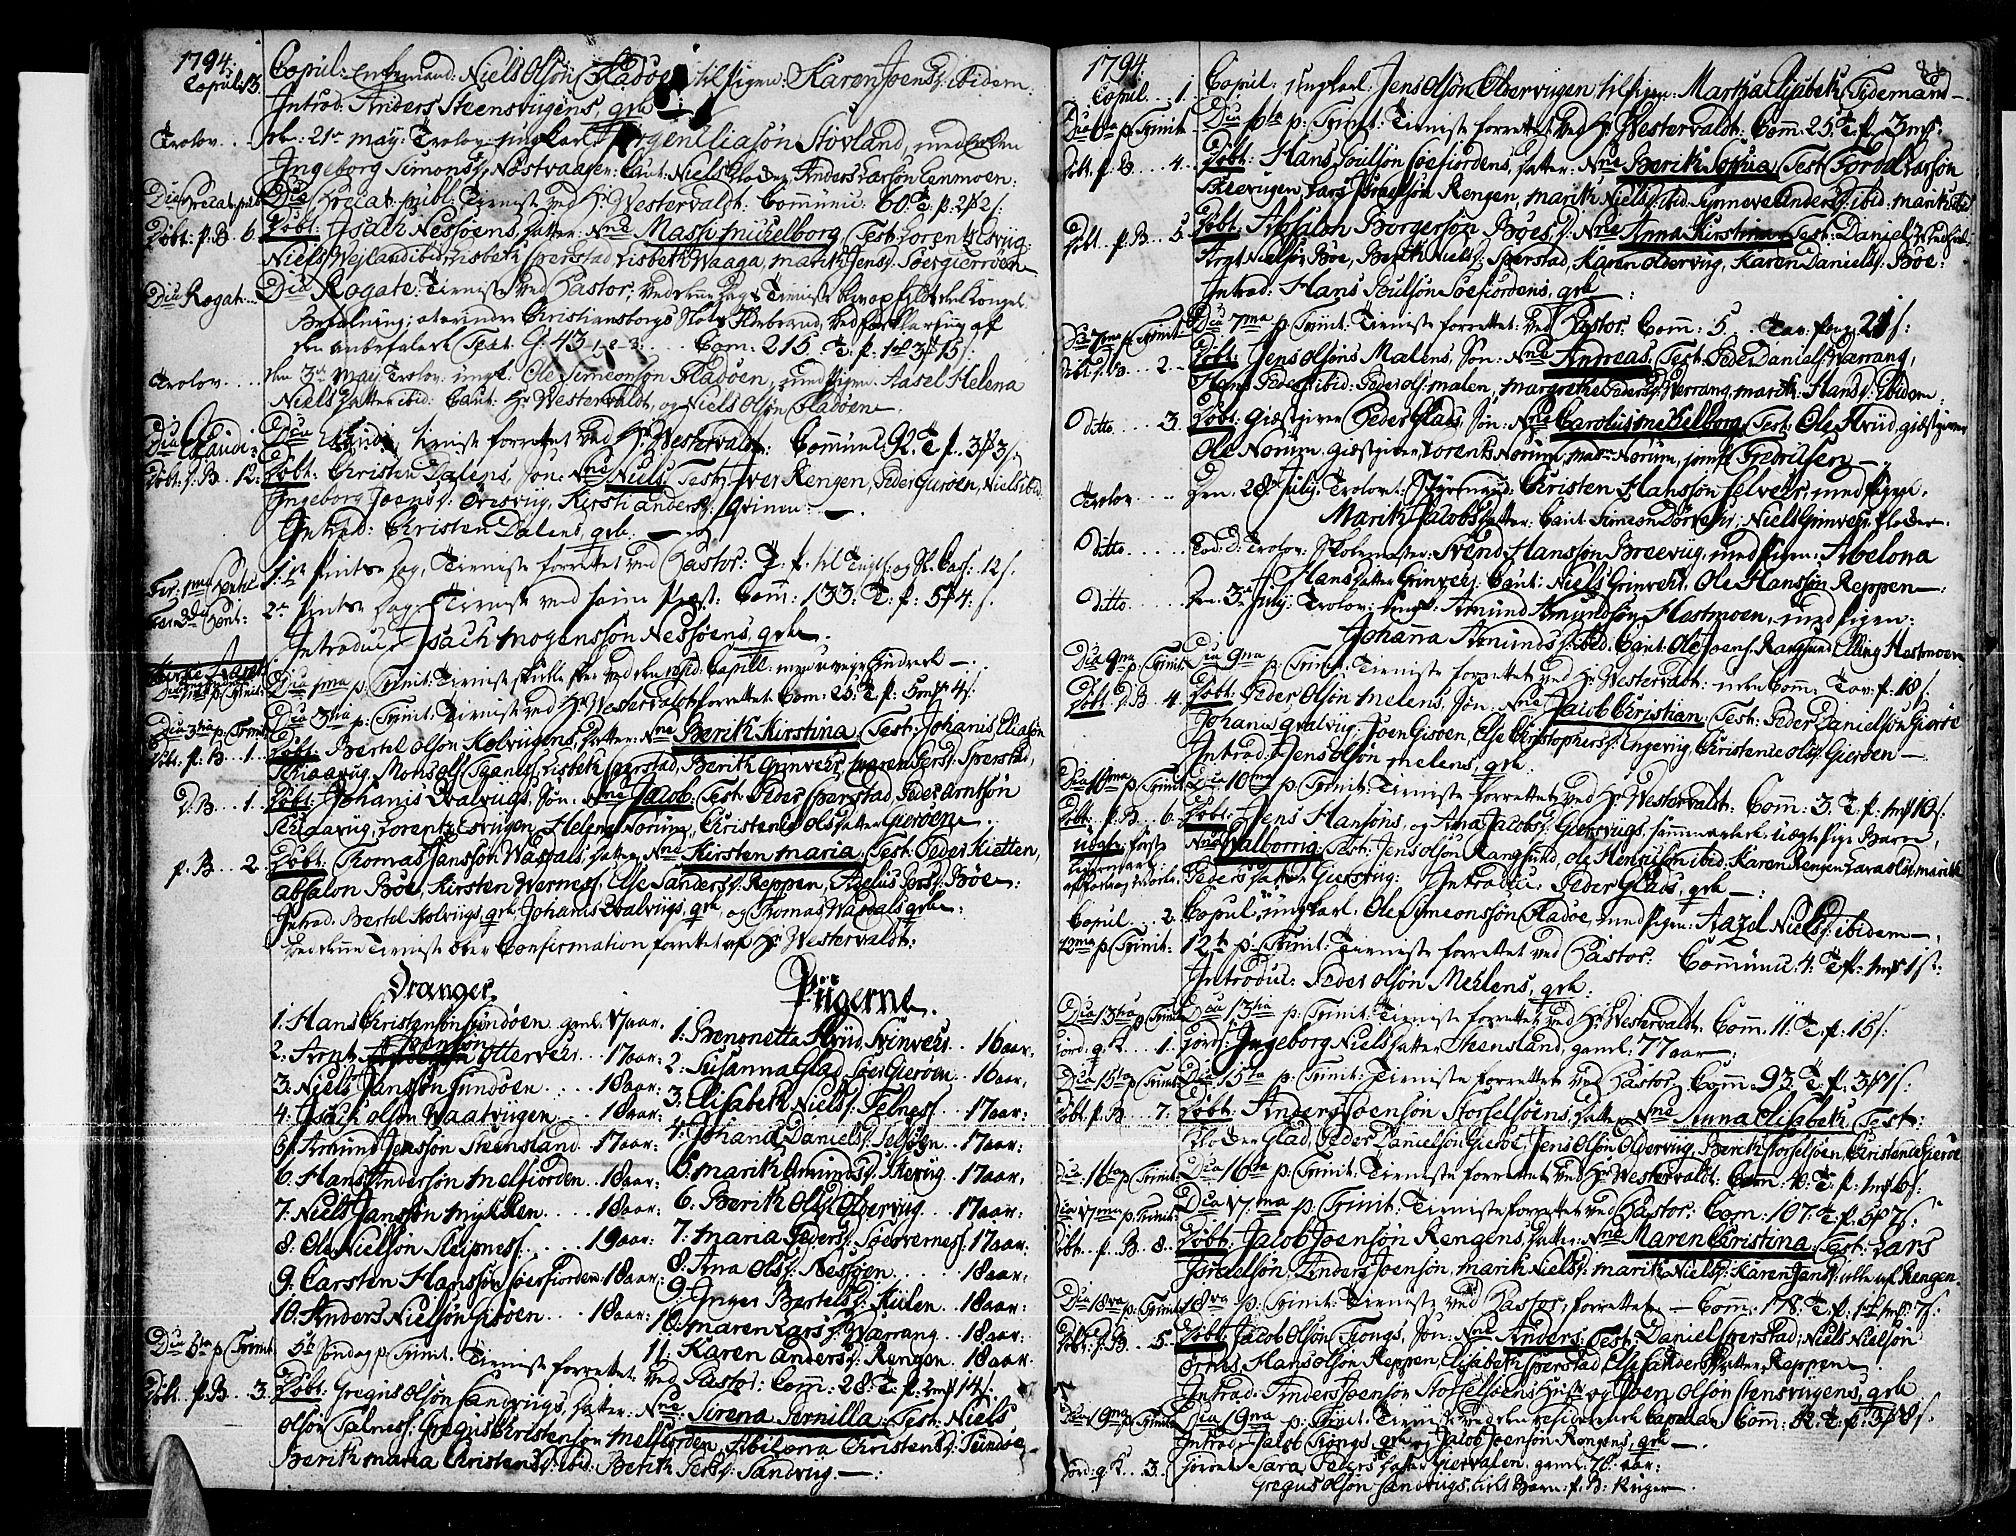 SAT, Ministerialprotokoller, klokkerbøker og fødselsregistre - Nordland, 841/L0591: Ministerialbok nr. 841A03 /1, 1777-1819, s. 85-86